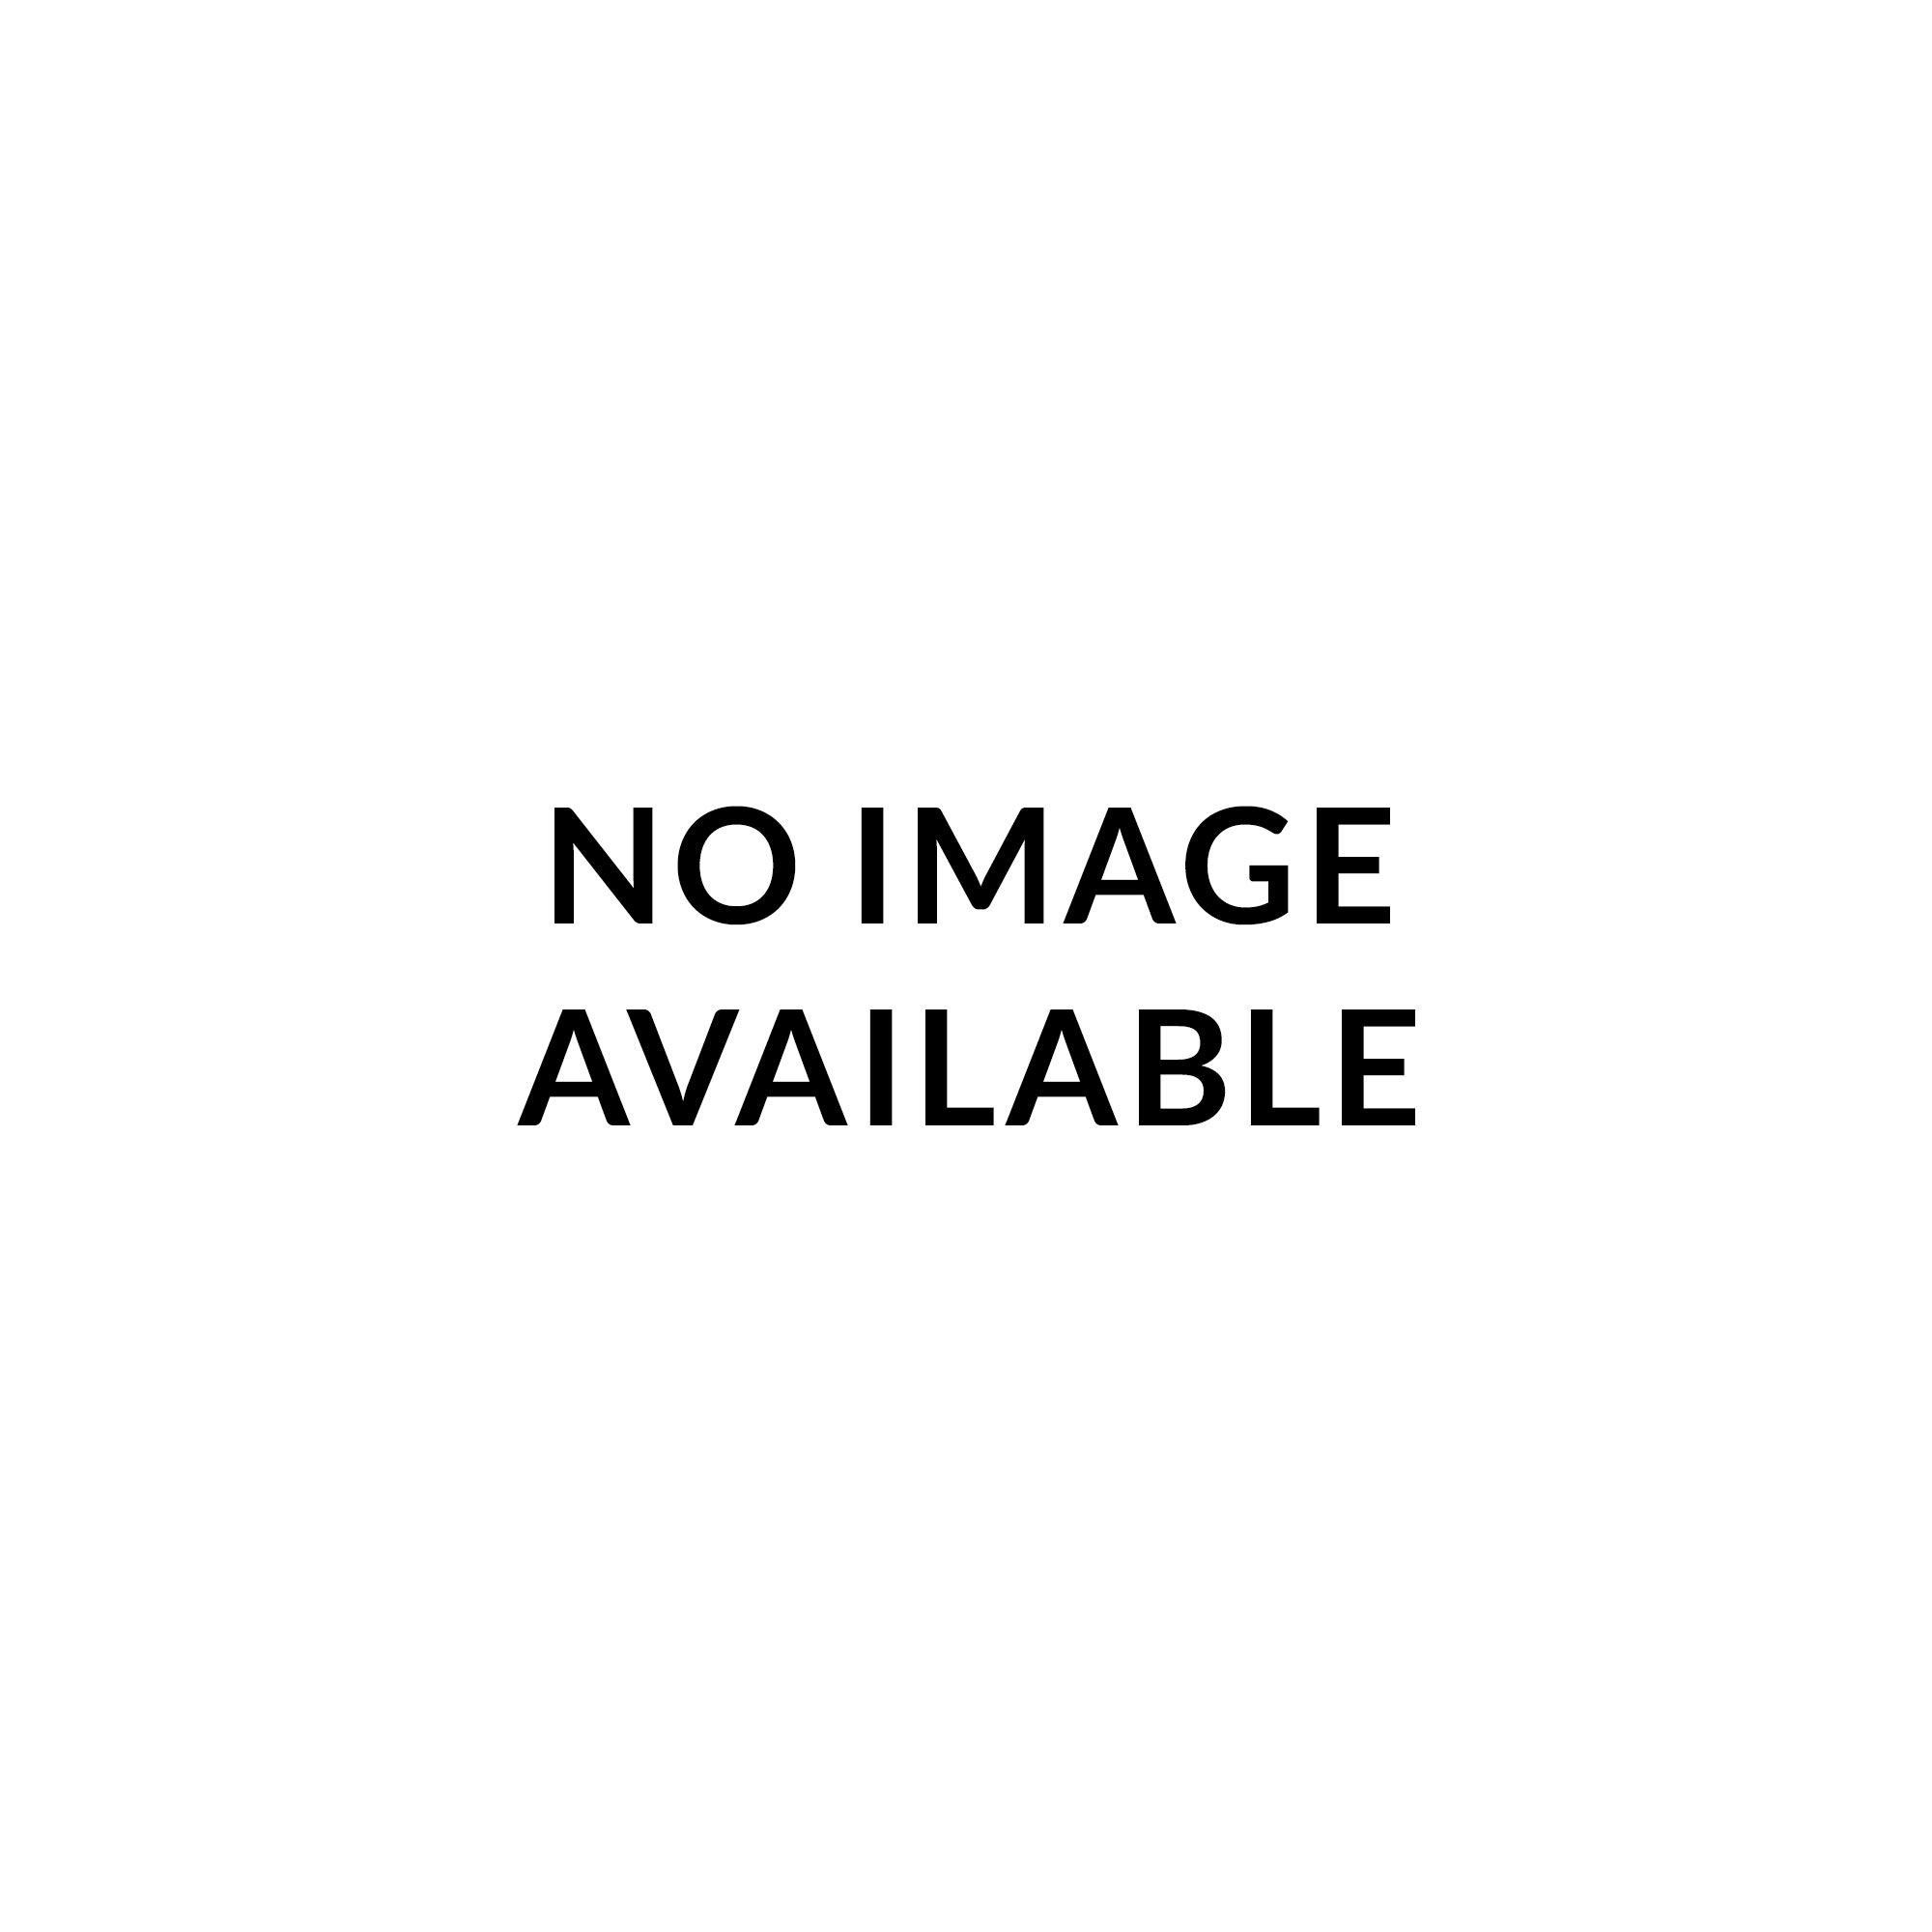 Fender Genuine Bass/Telecaster Bridge/Strap Button Mounting Screw 002-1422-049